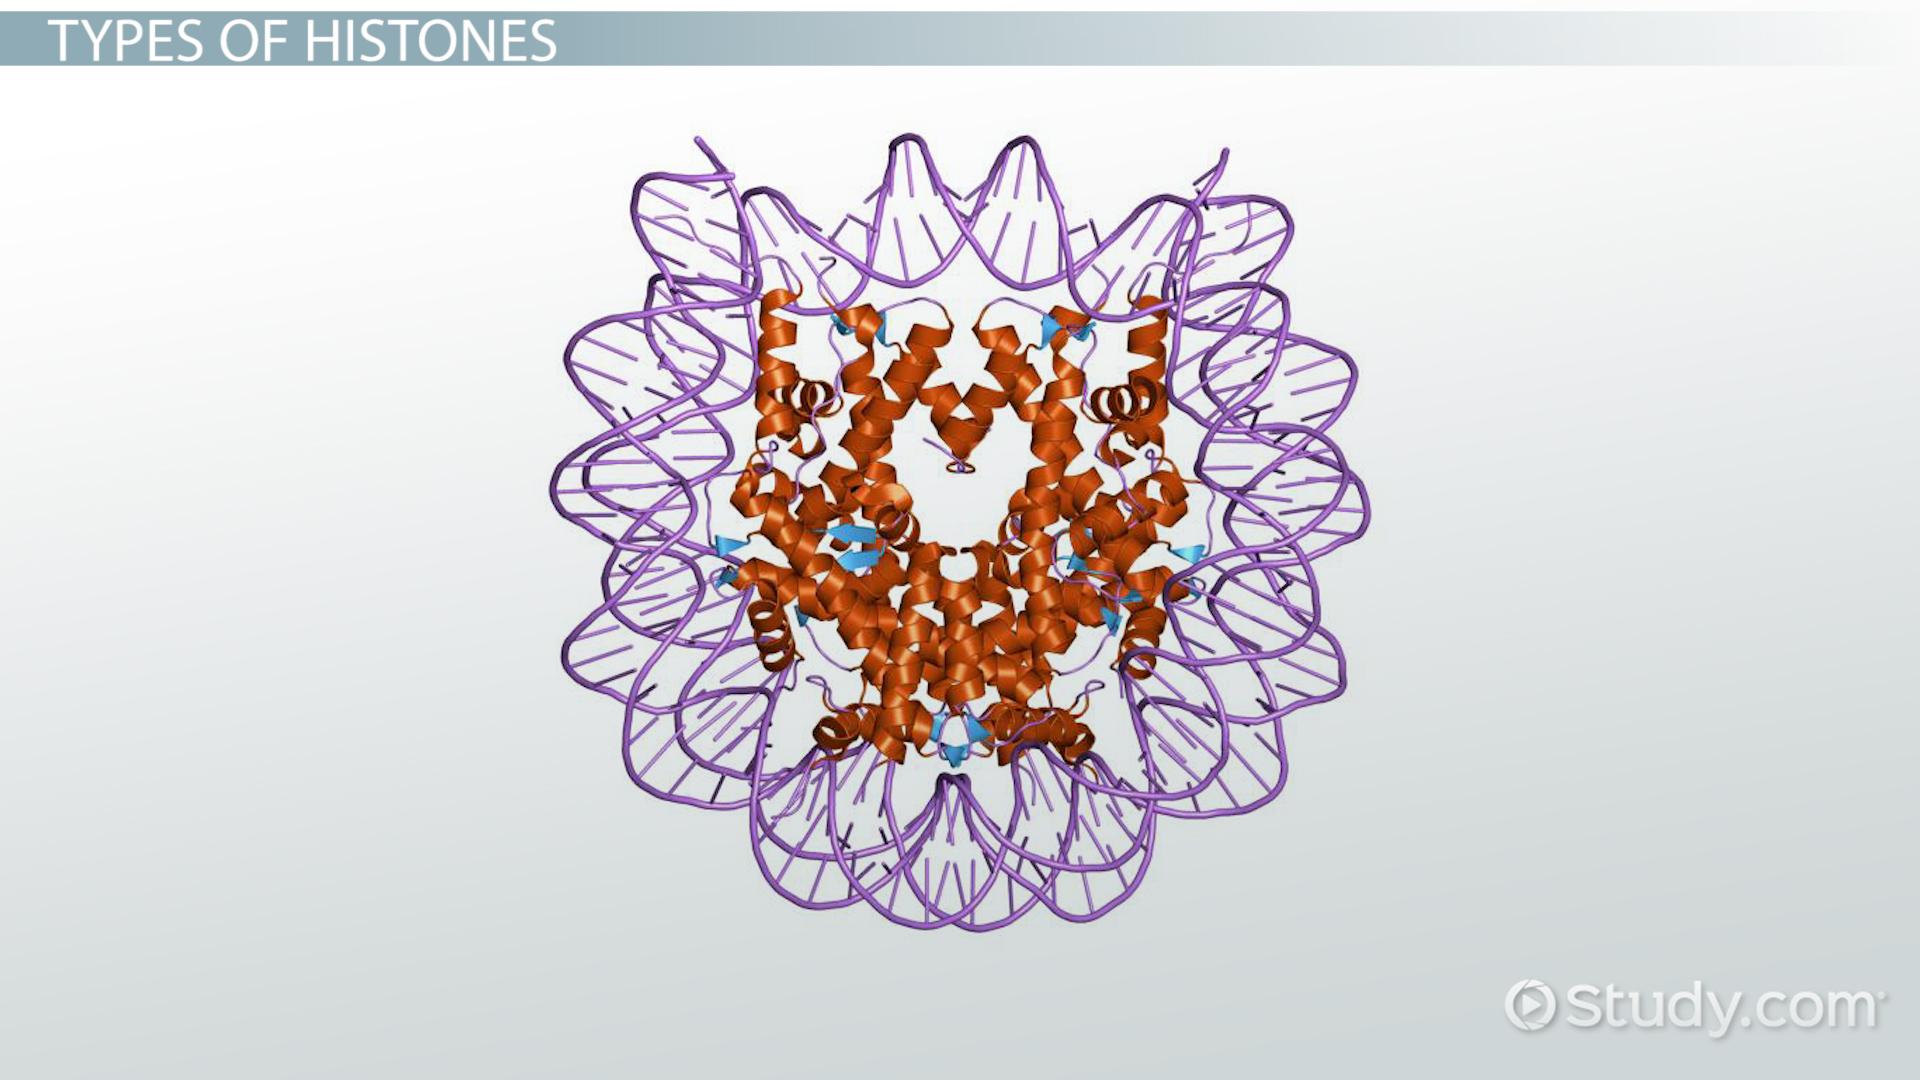 Histones Function  Types  Video  Lesson Transcript